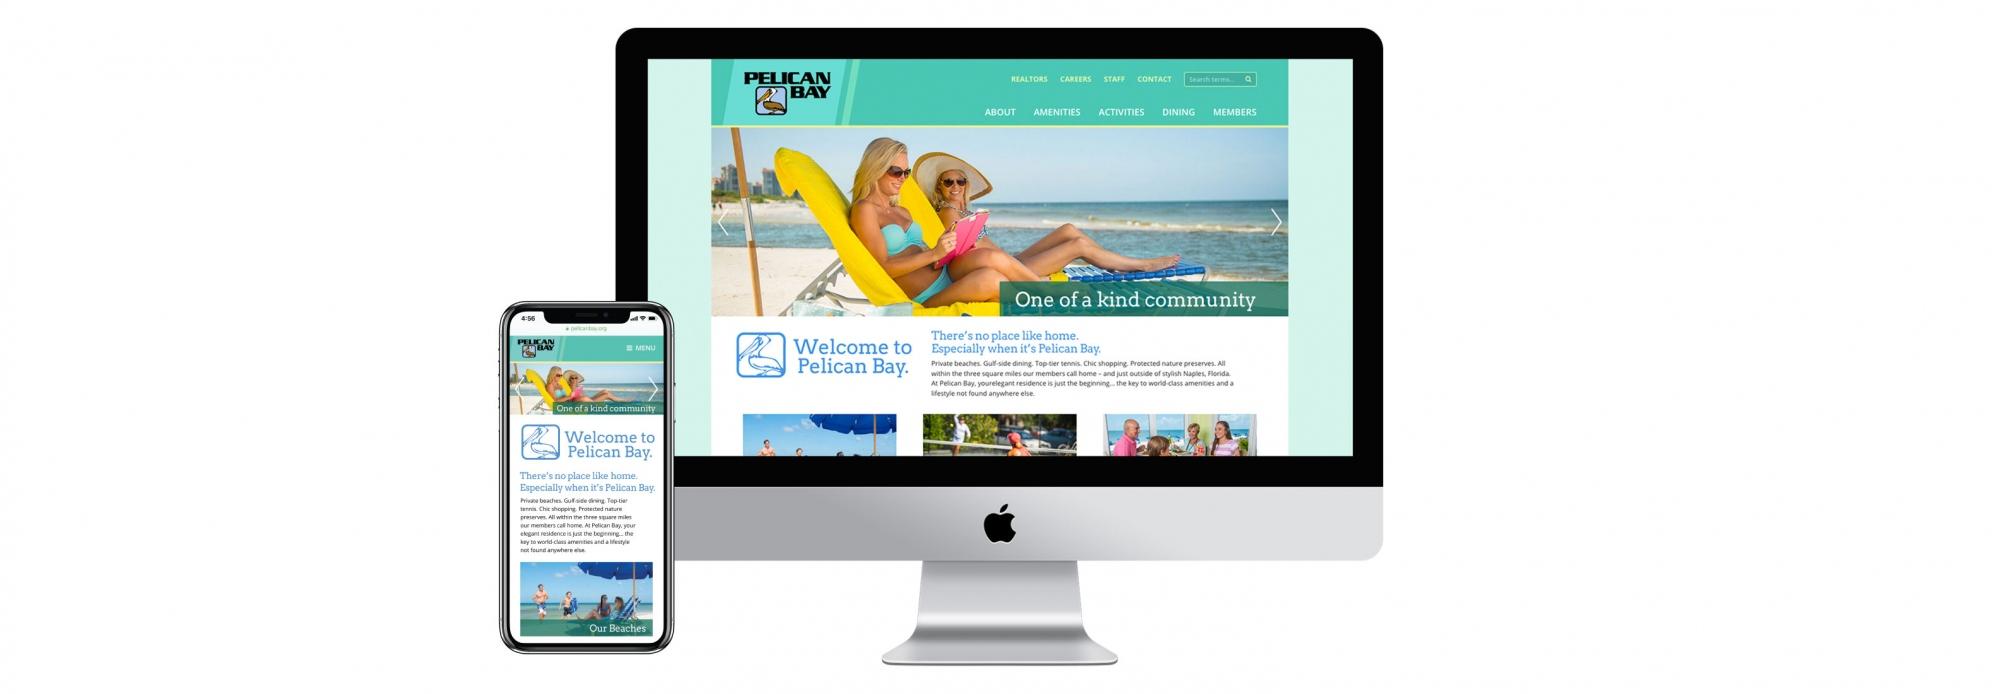 website on a computer